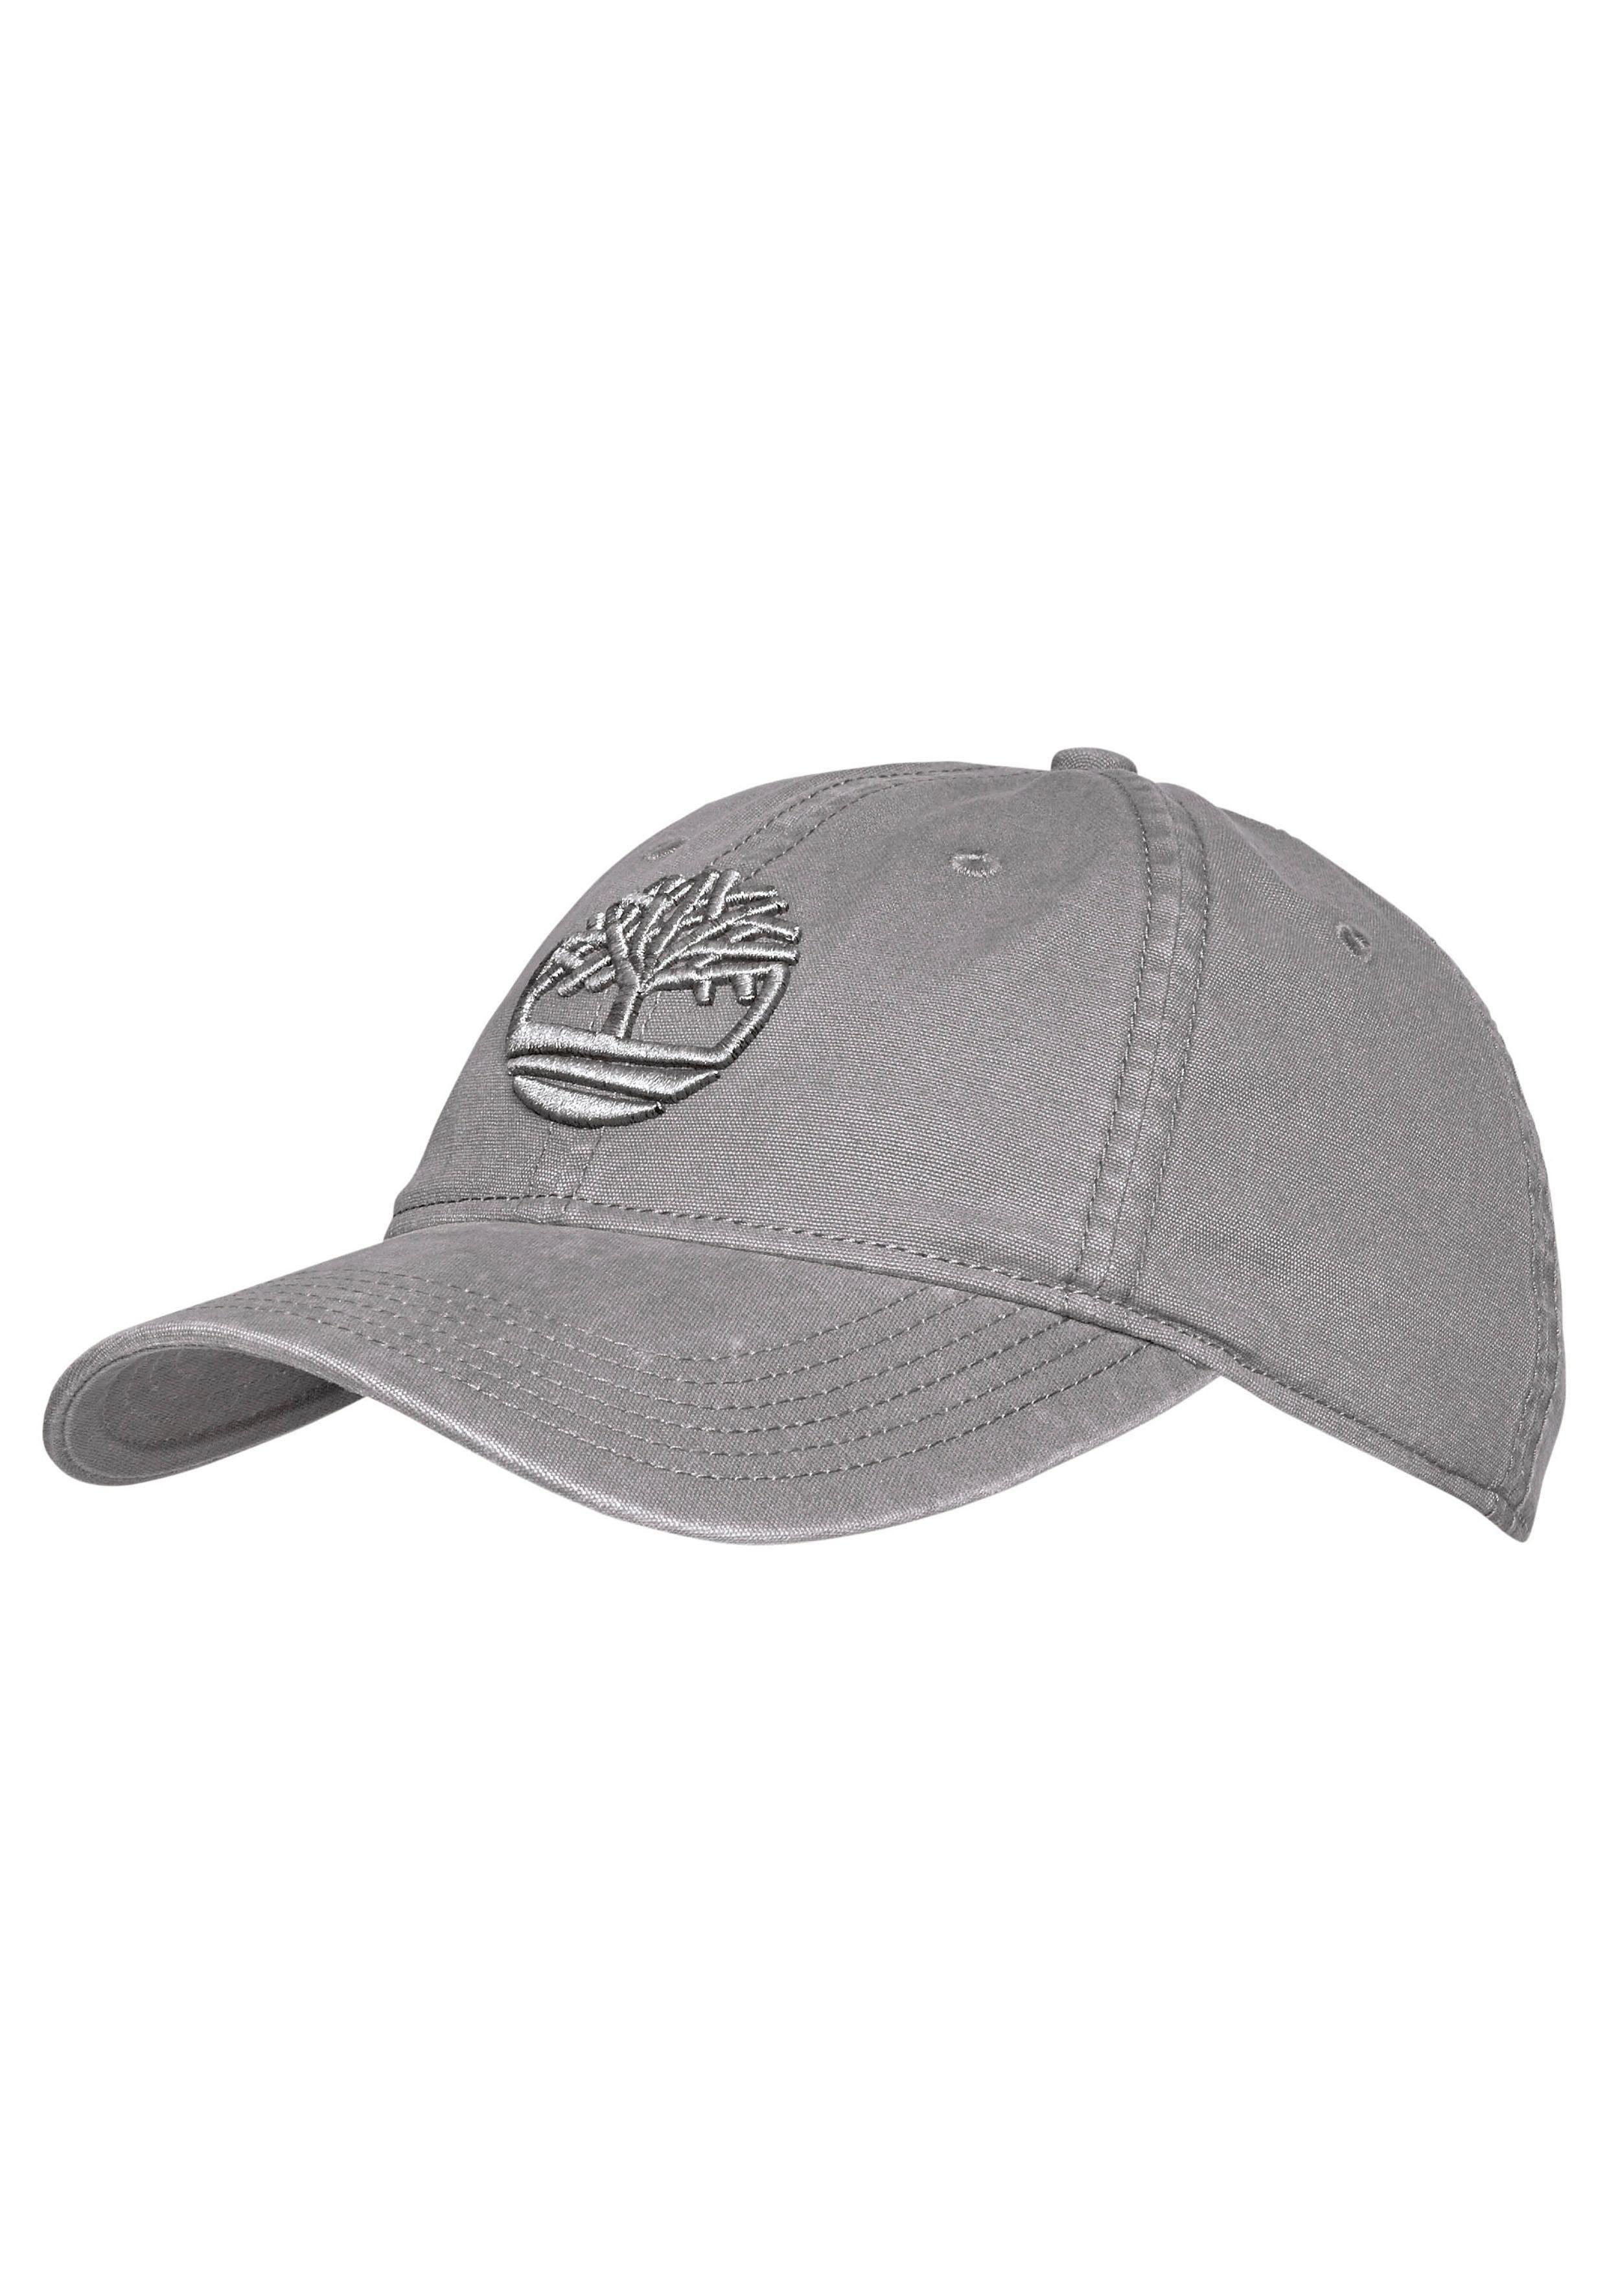 Timberland Baseball Cap